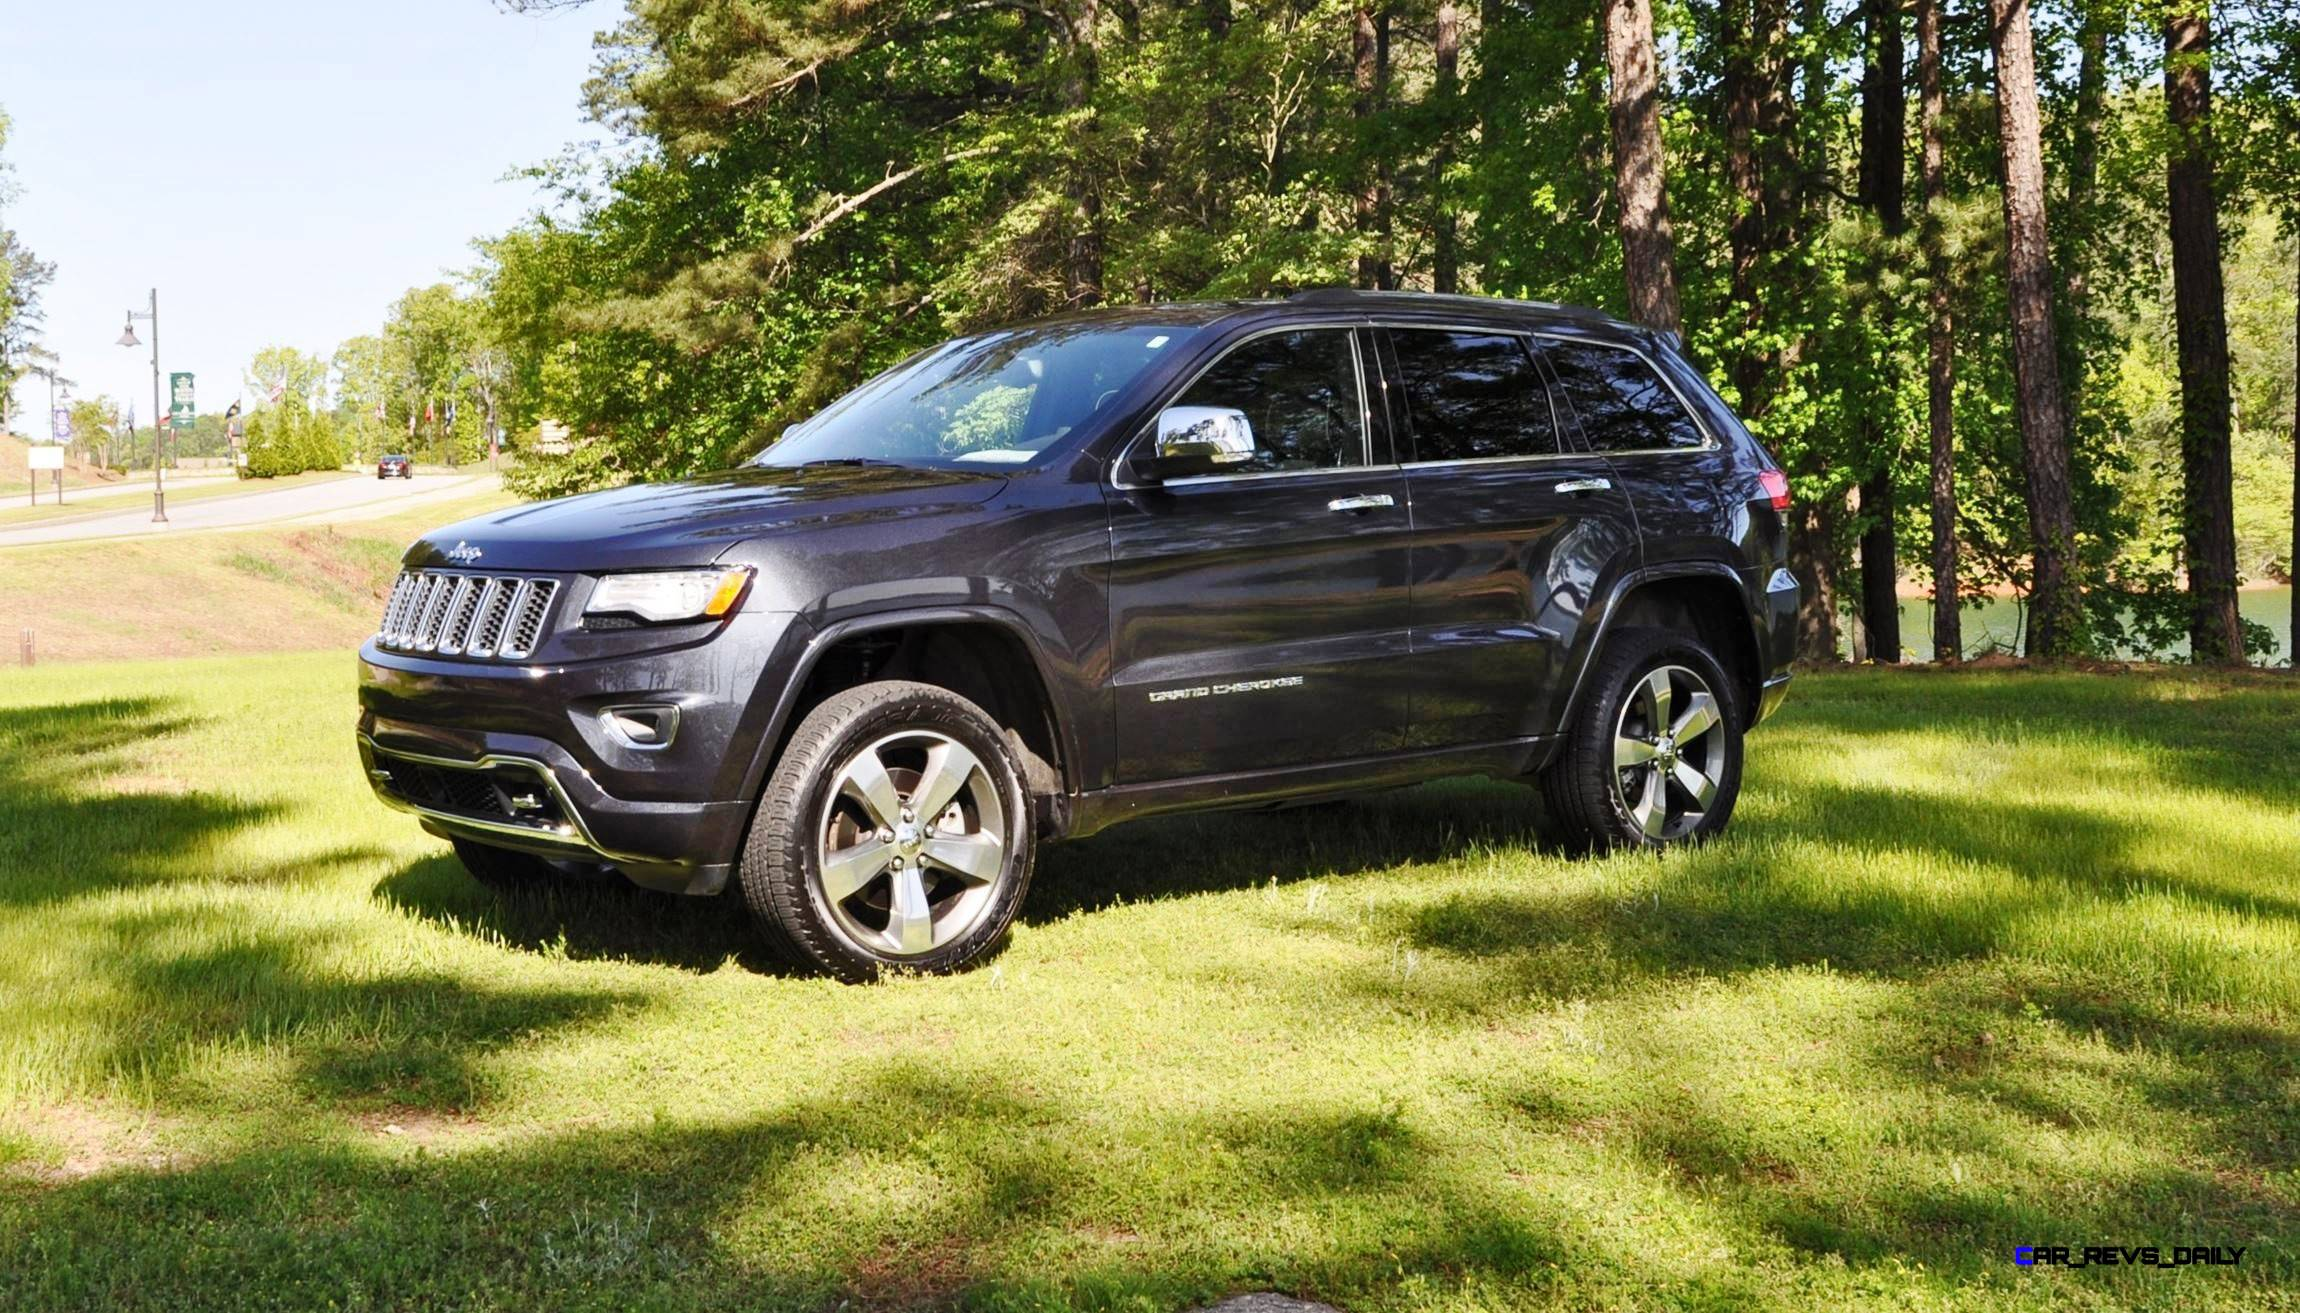 2015 jeep grand cherokee ecodiesel. Black Bedroom Furniture Sets. Home Design Ideas